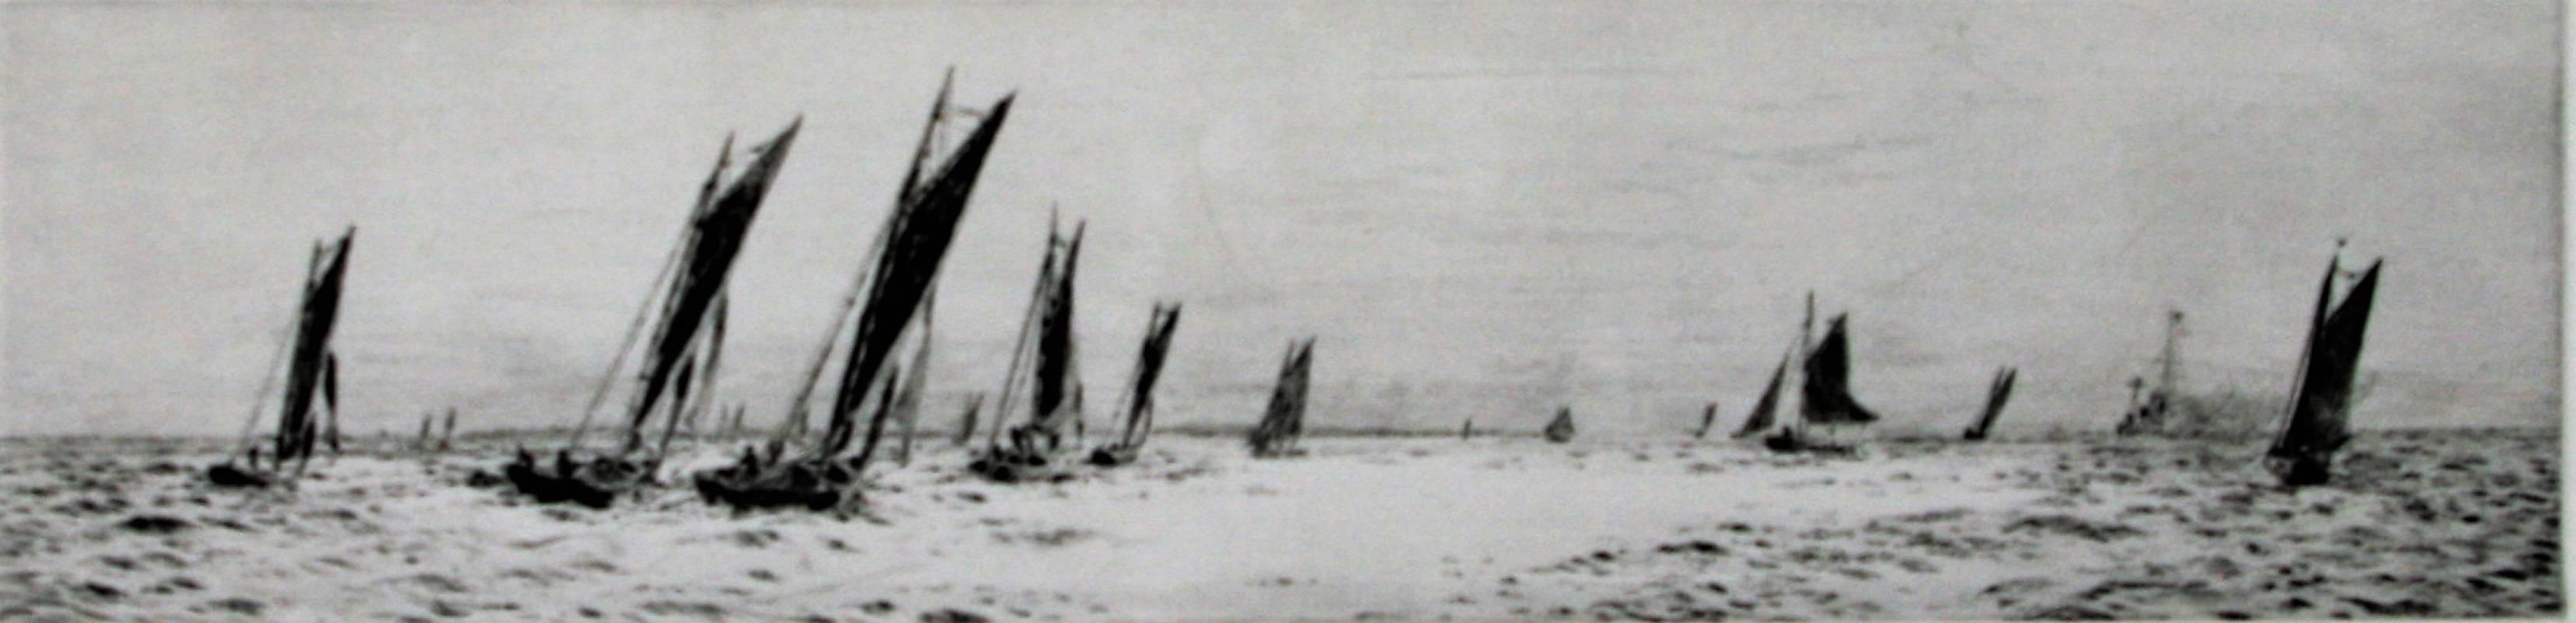 Trawler Fleet